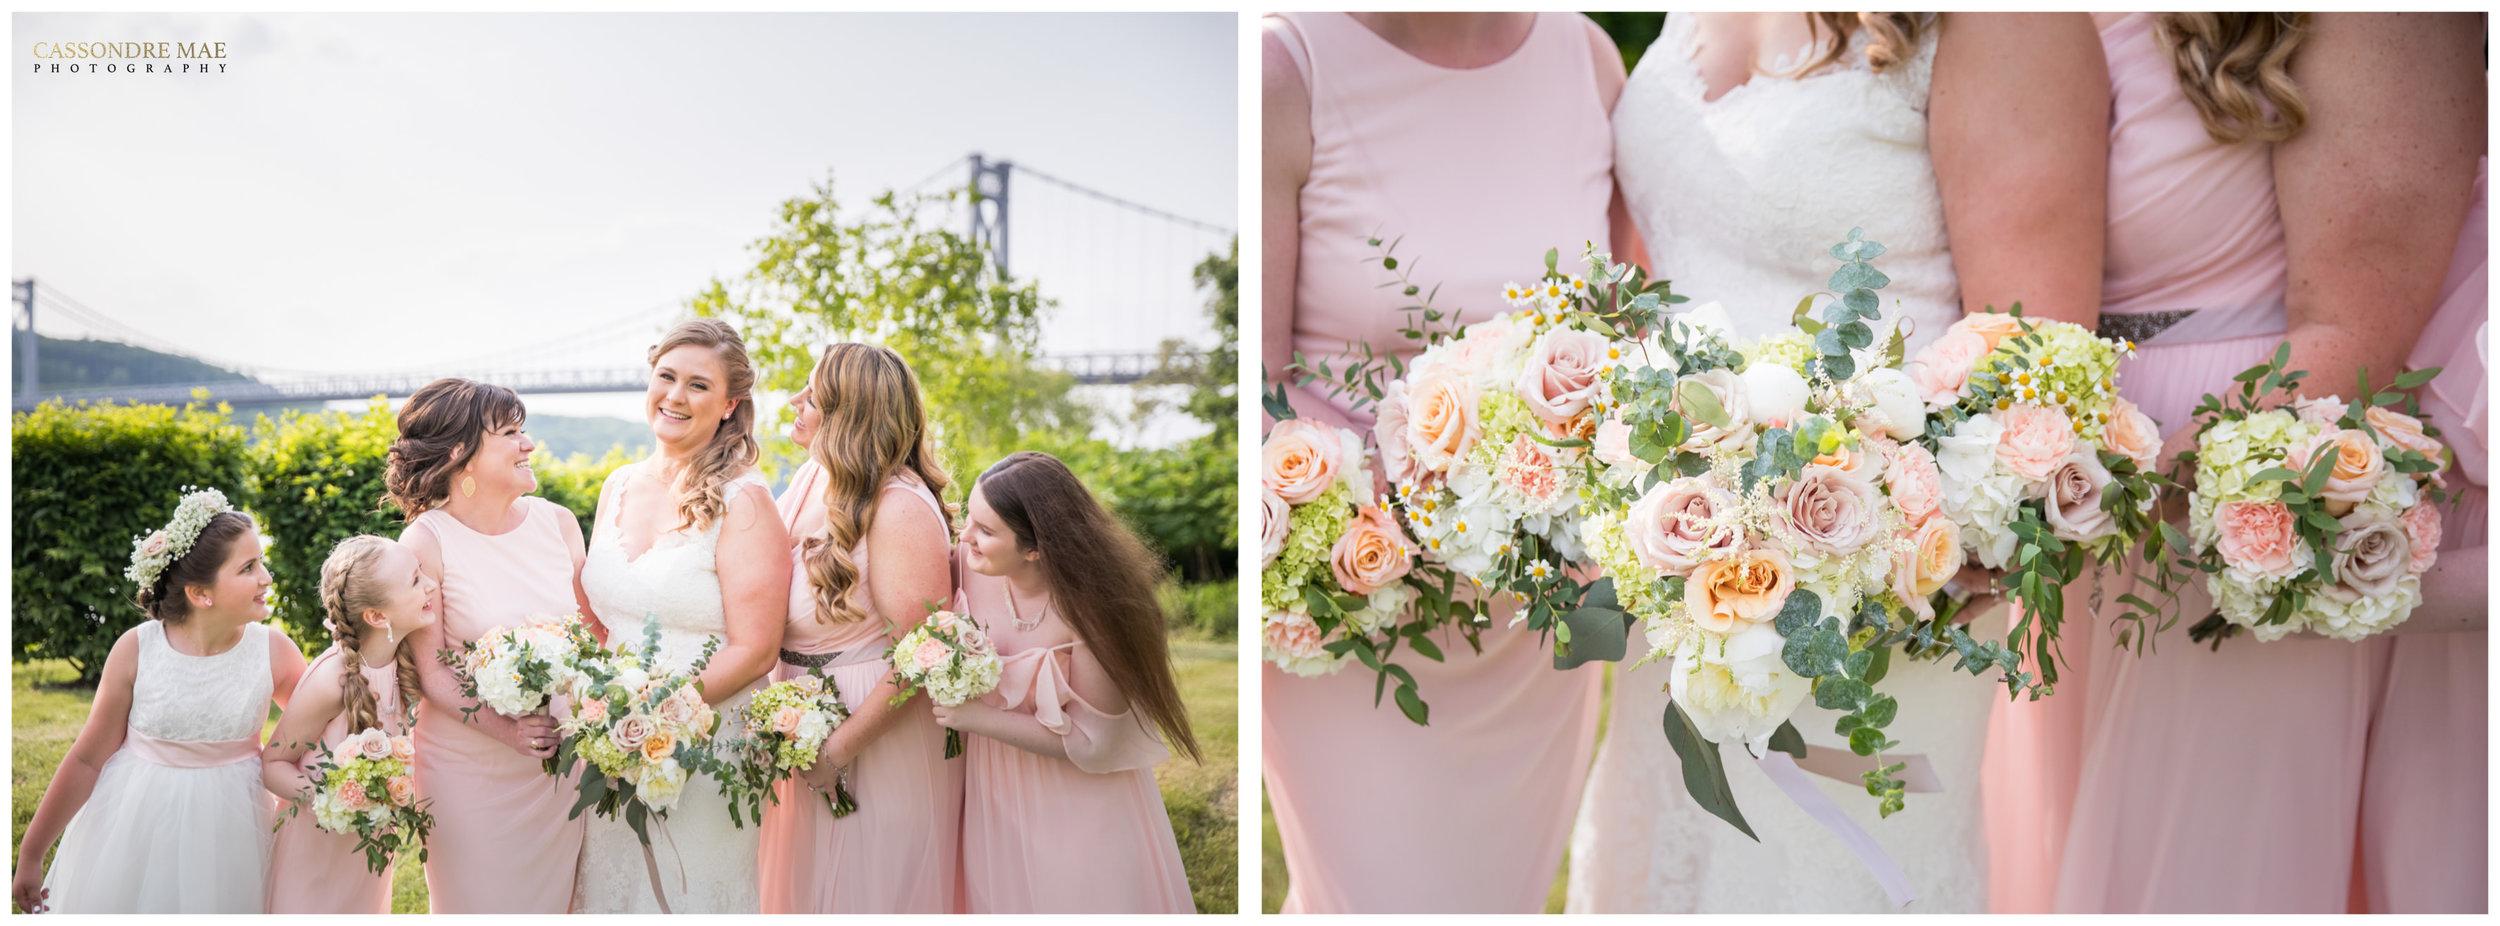 Cassondre Mae Photography Grandview Wedding Photos Poughkeepsie NY Hudson Valley 17.jpg